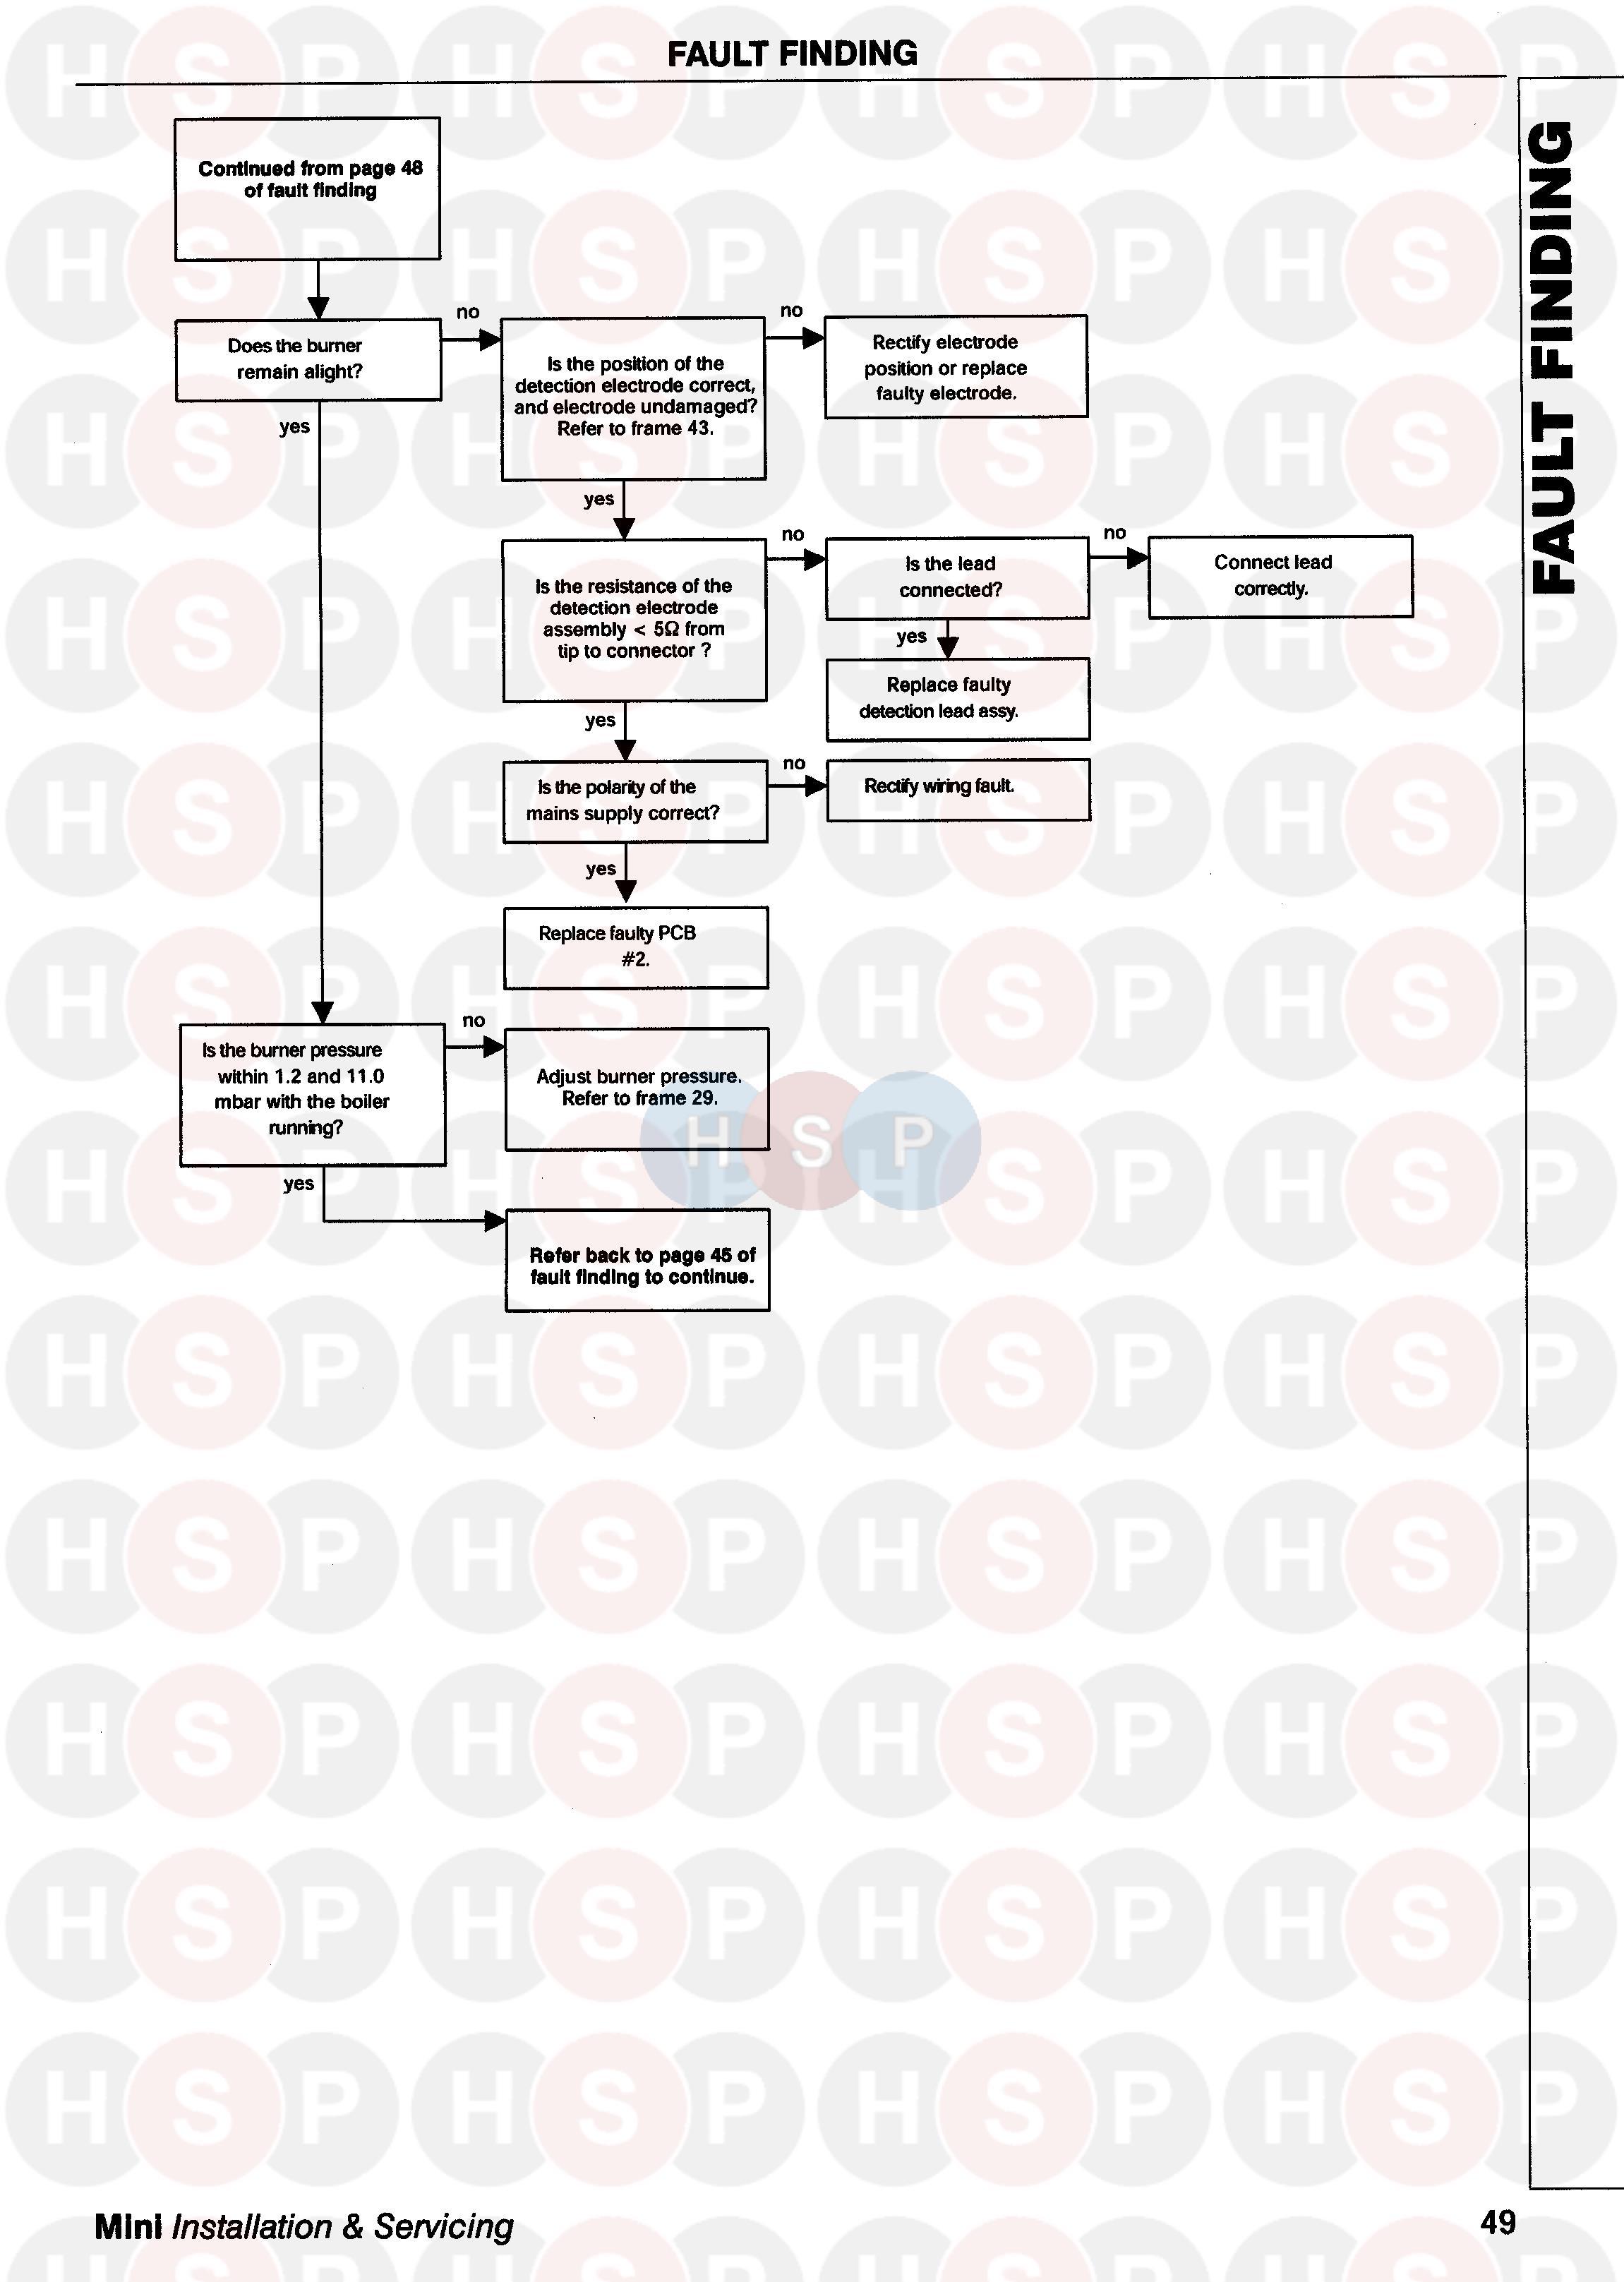 Ideal Mini C28  Service Fault Finding 5  Diagram